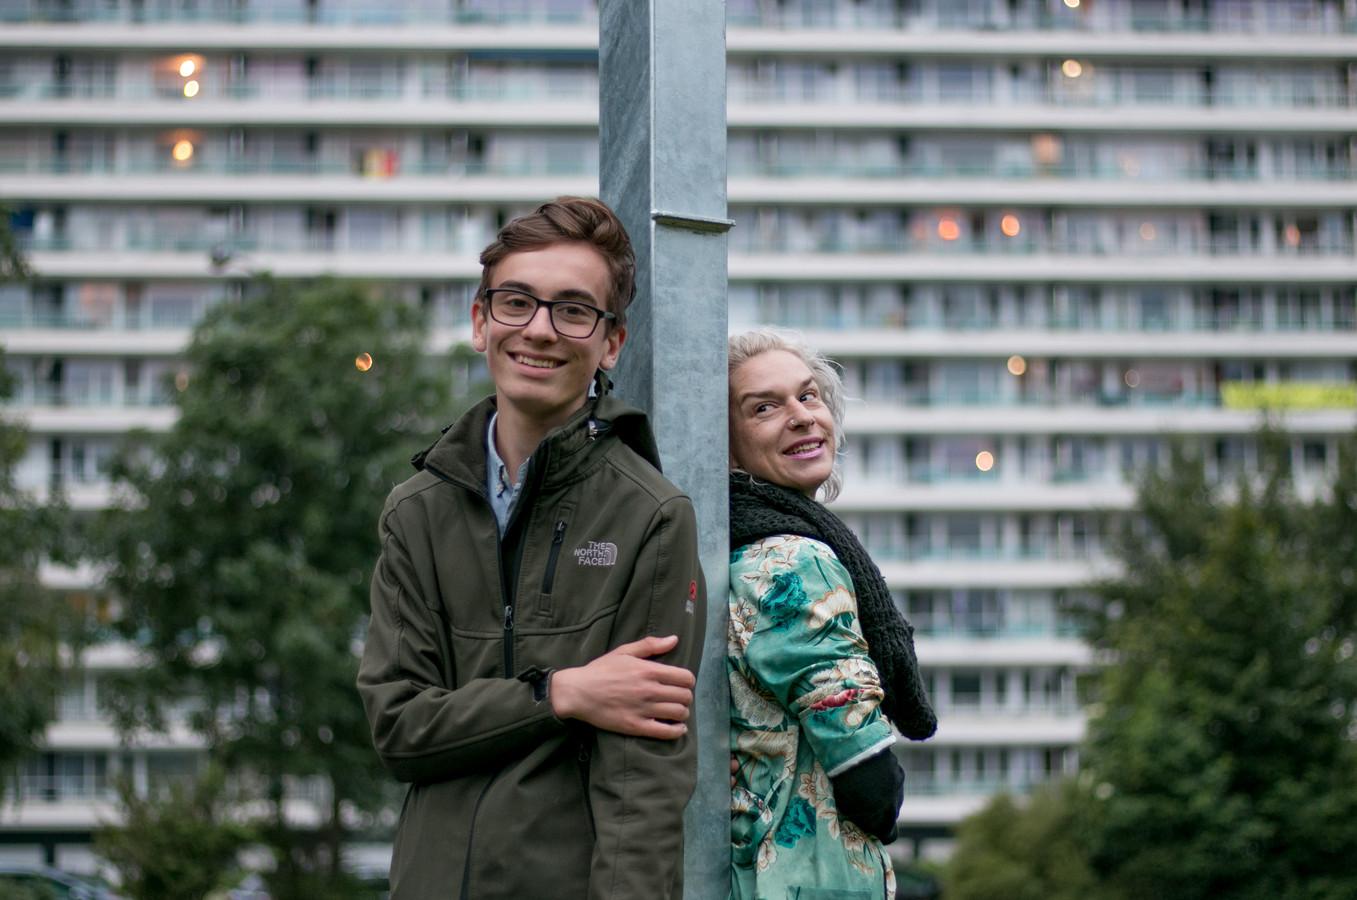 Mauro Pauwels en zijn mama July Vaerewyck.